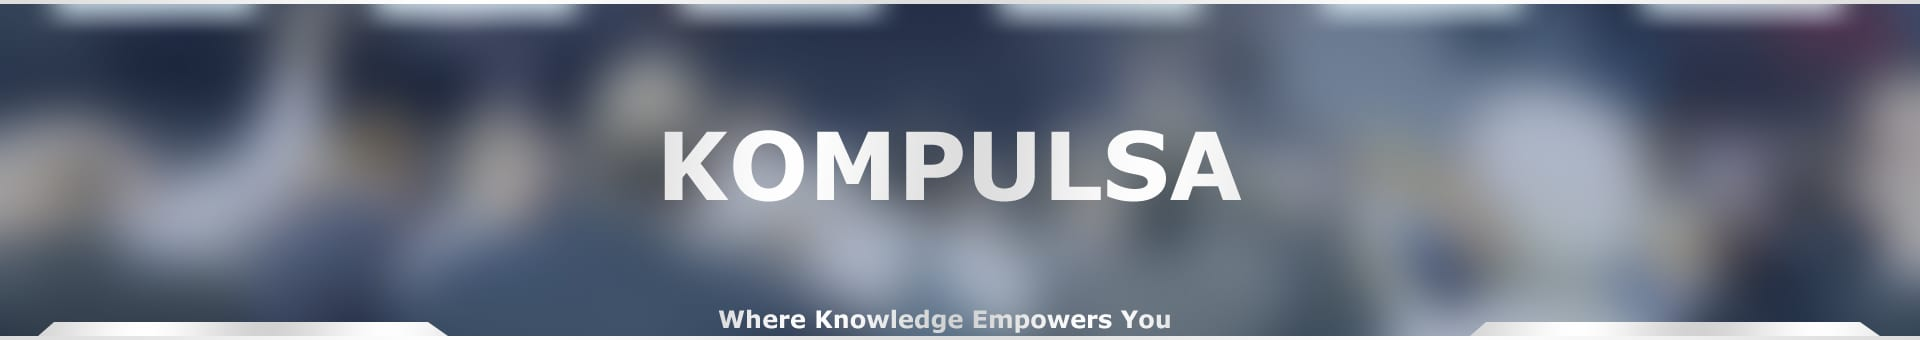 Kompulsa Logo